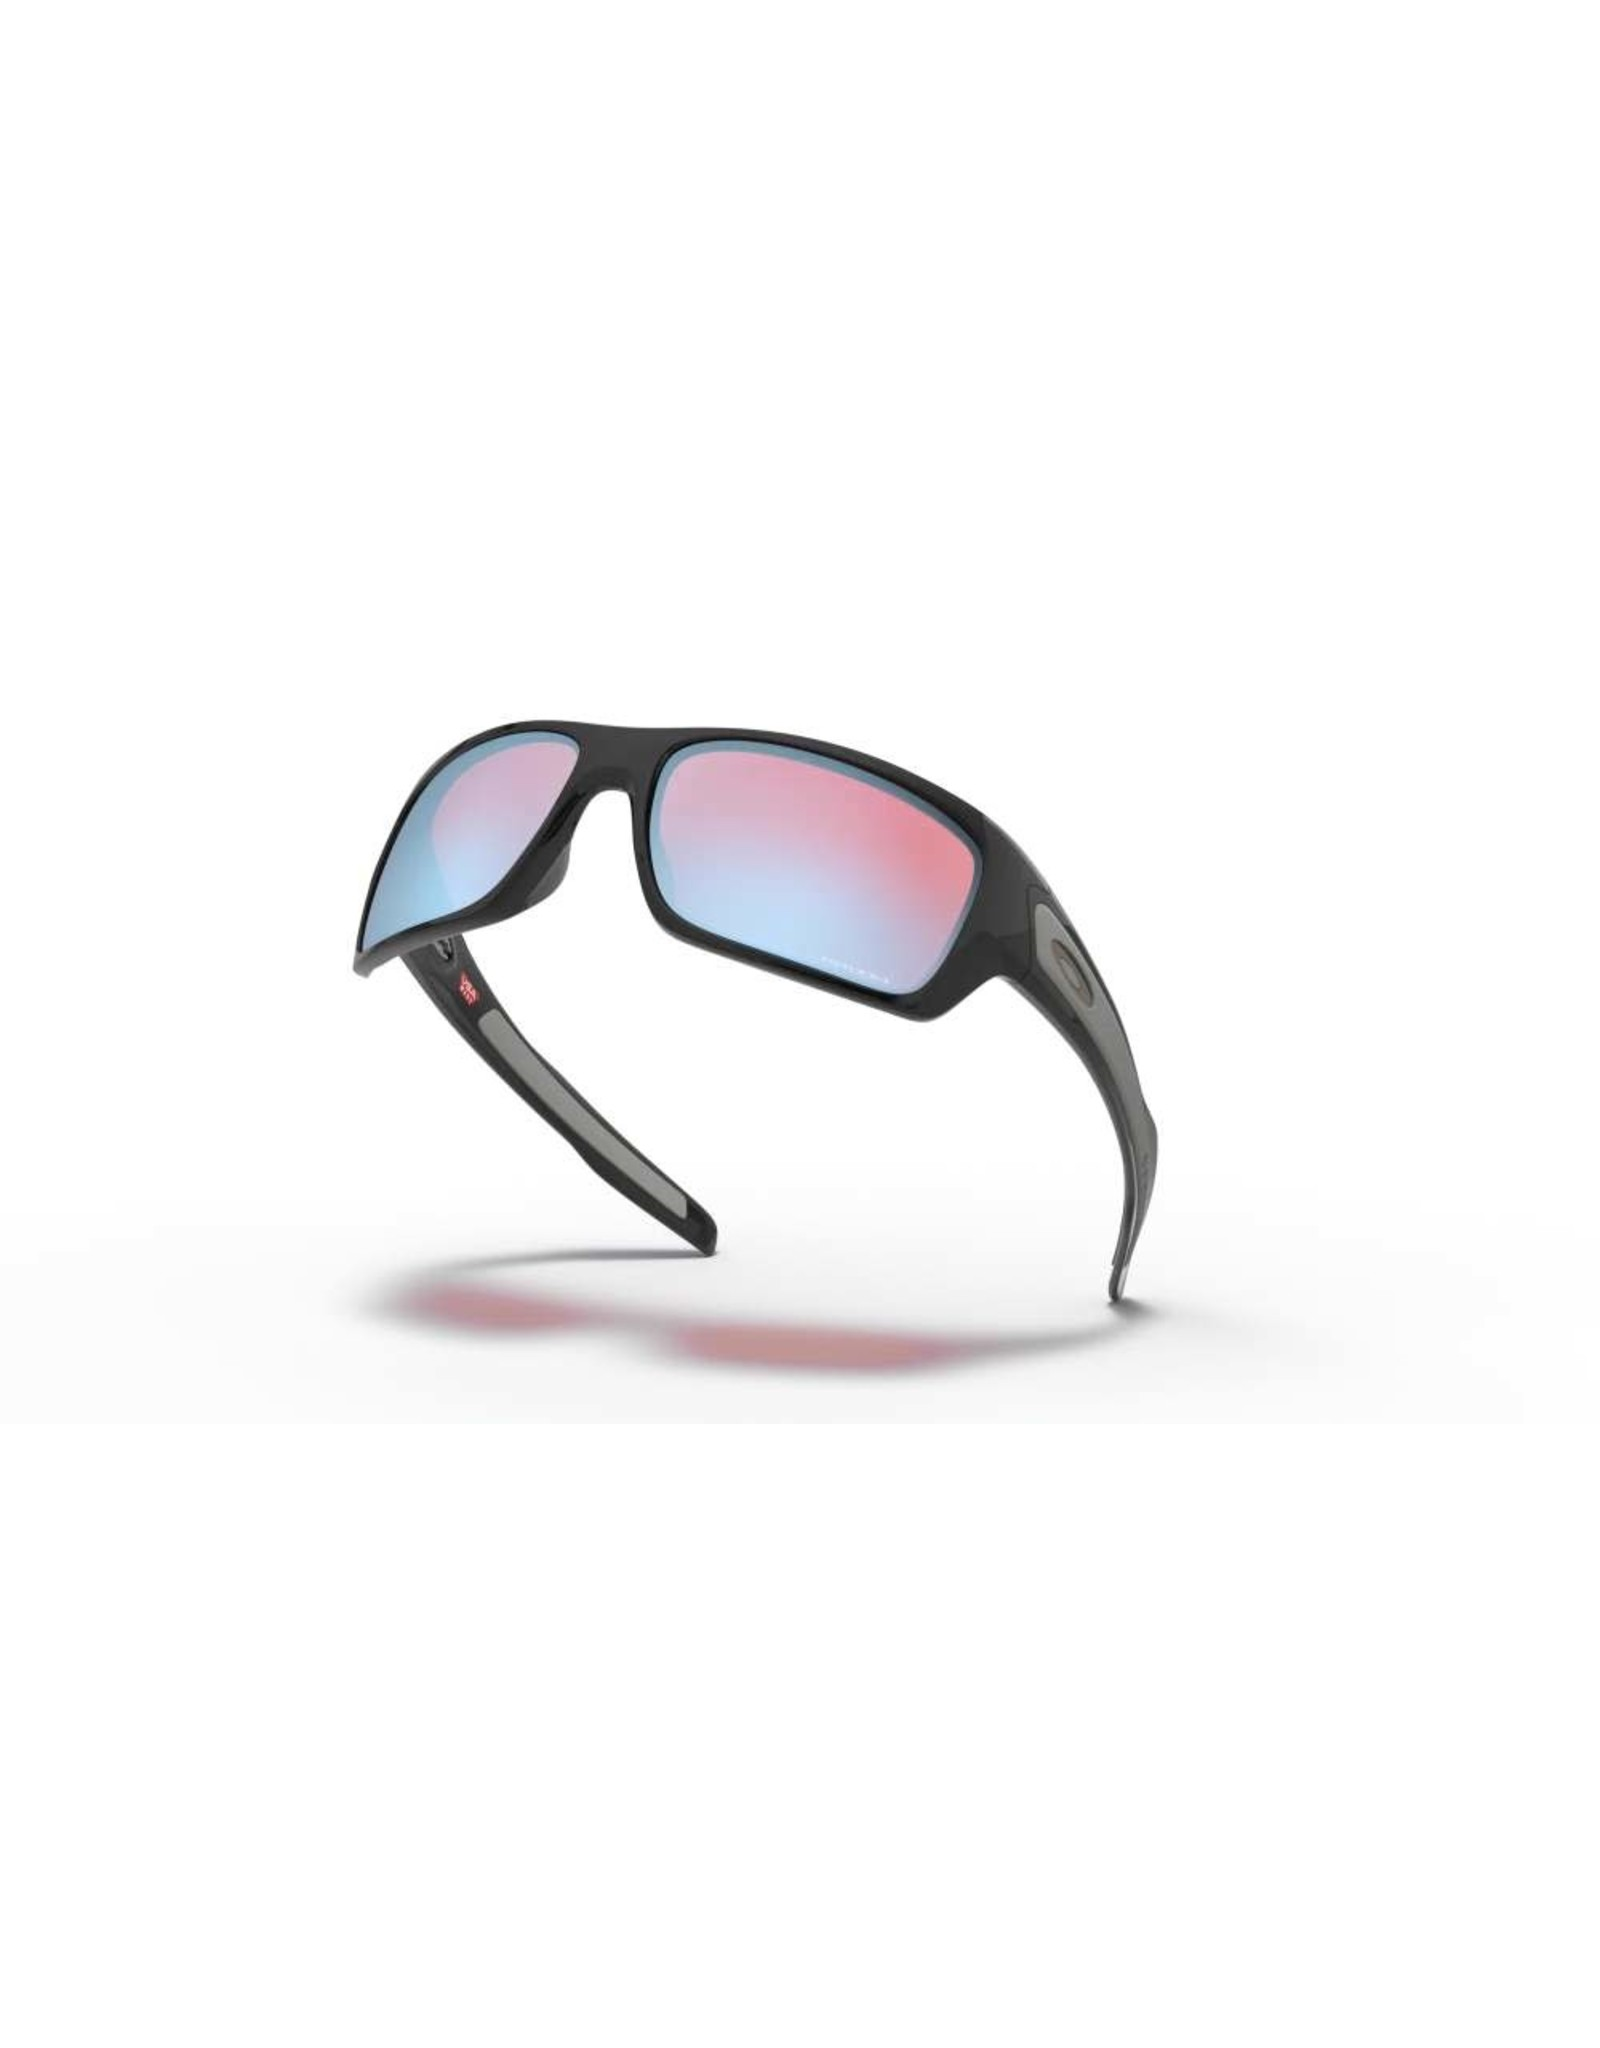 OAKLEY Oakley Turbine polished black w prizm snow sapphire iridum sunglasses